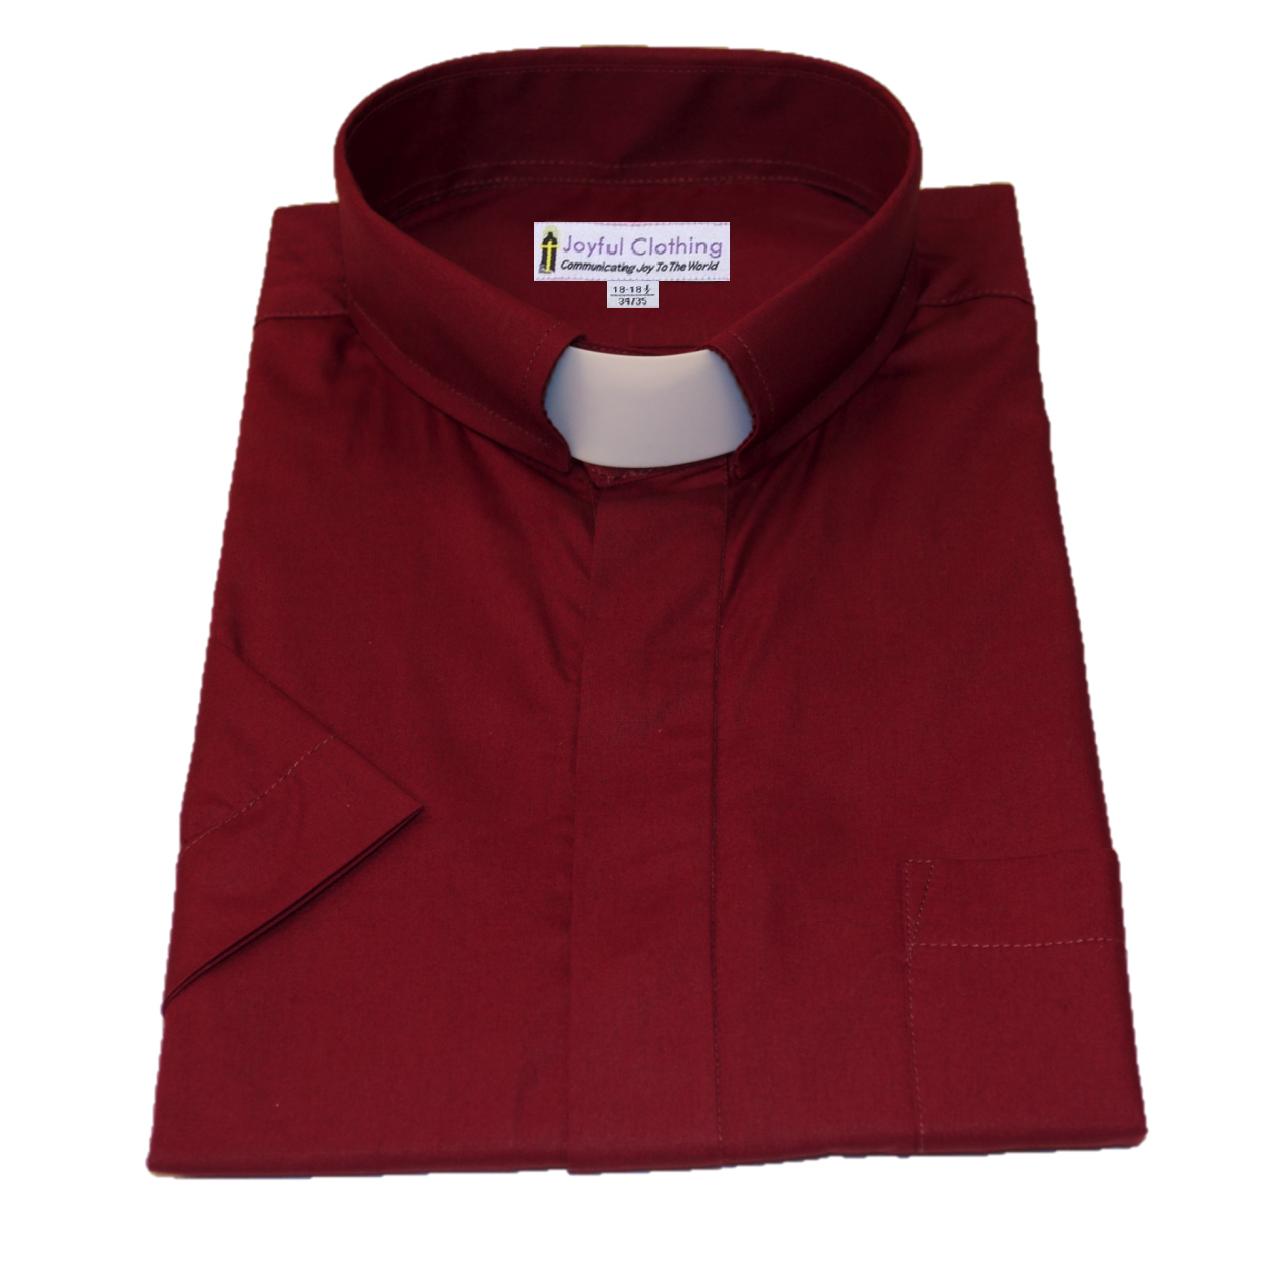 159. Men's Short-Sleeve Tab-Collar Clergy Shirt - Burgundy